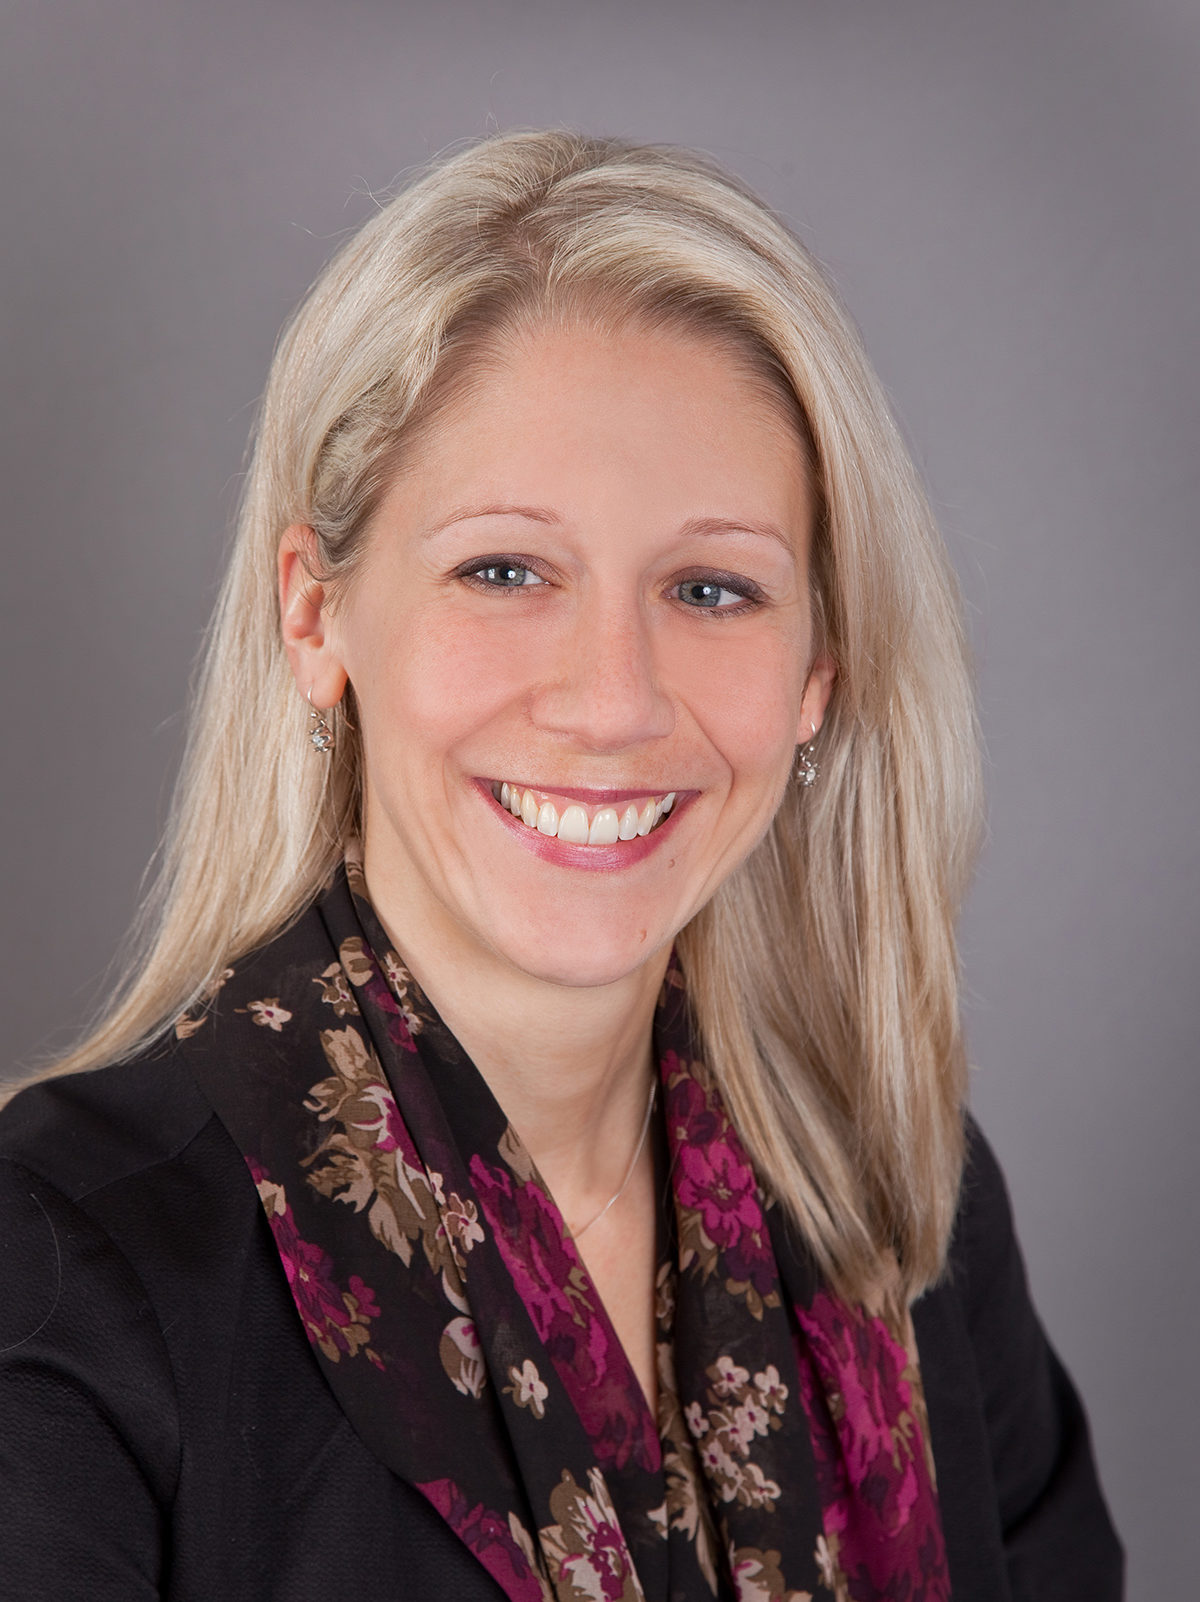 Shannon Majowicz